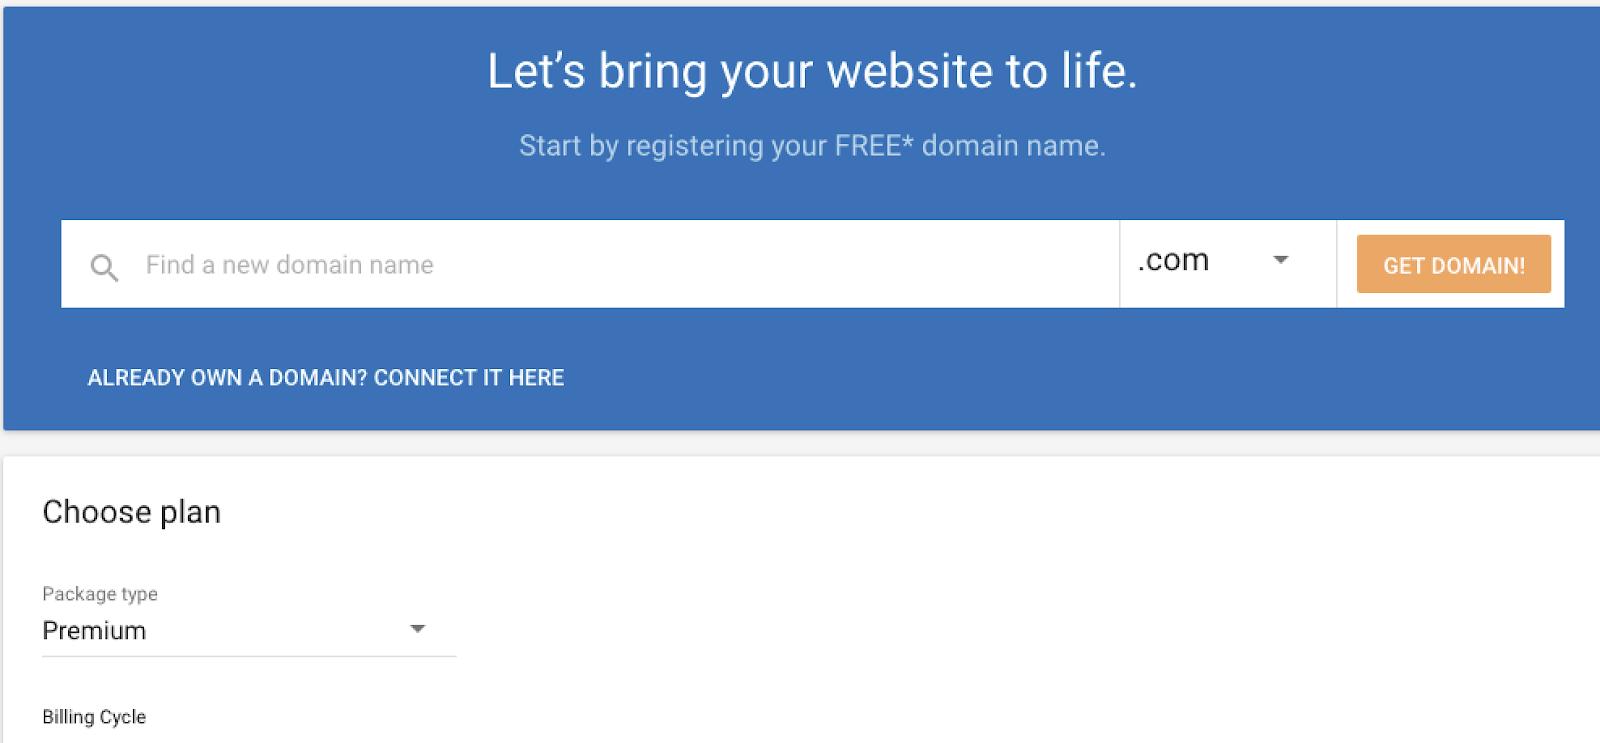 register domain name with gator website builder